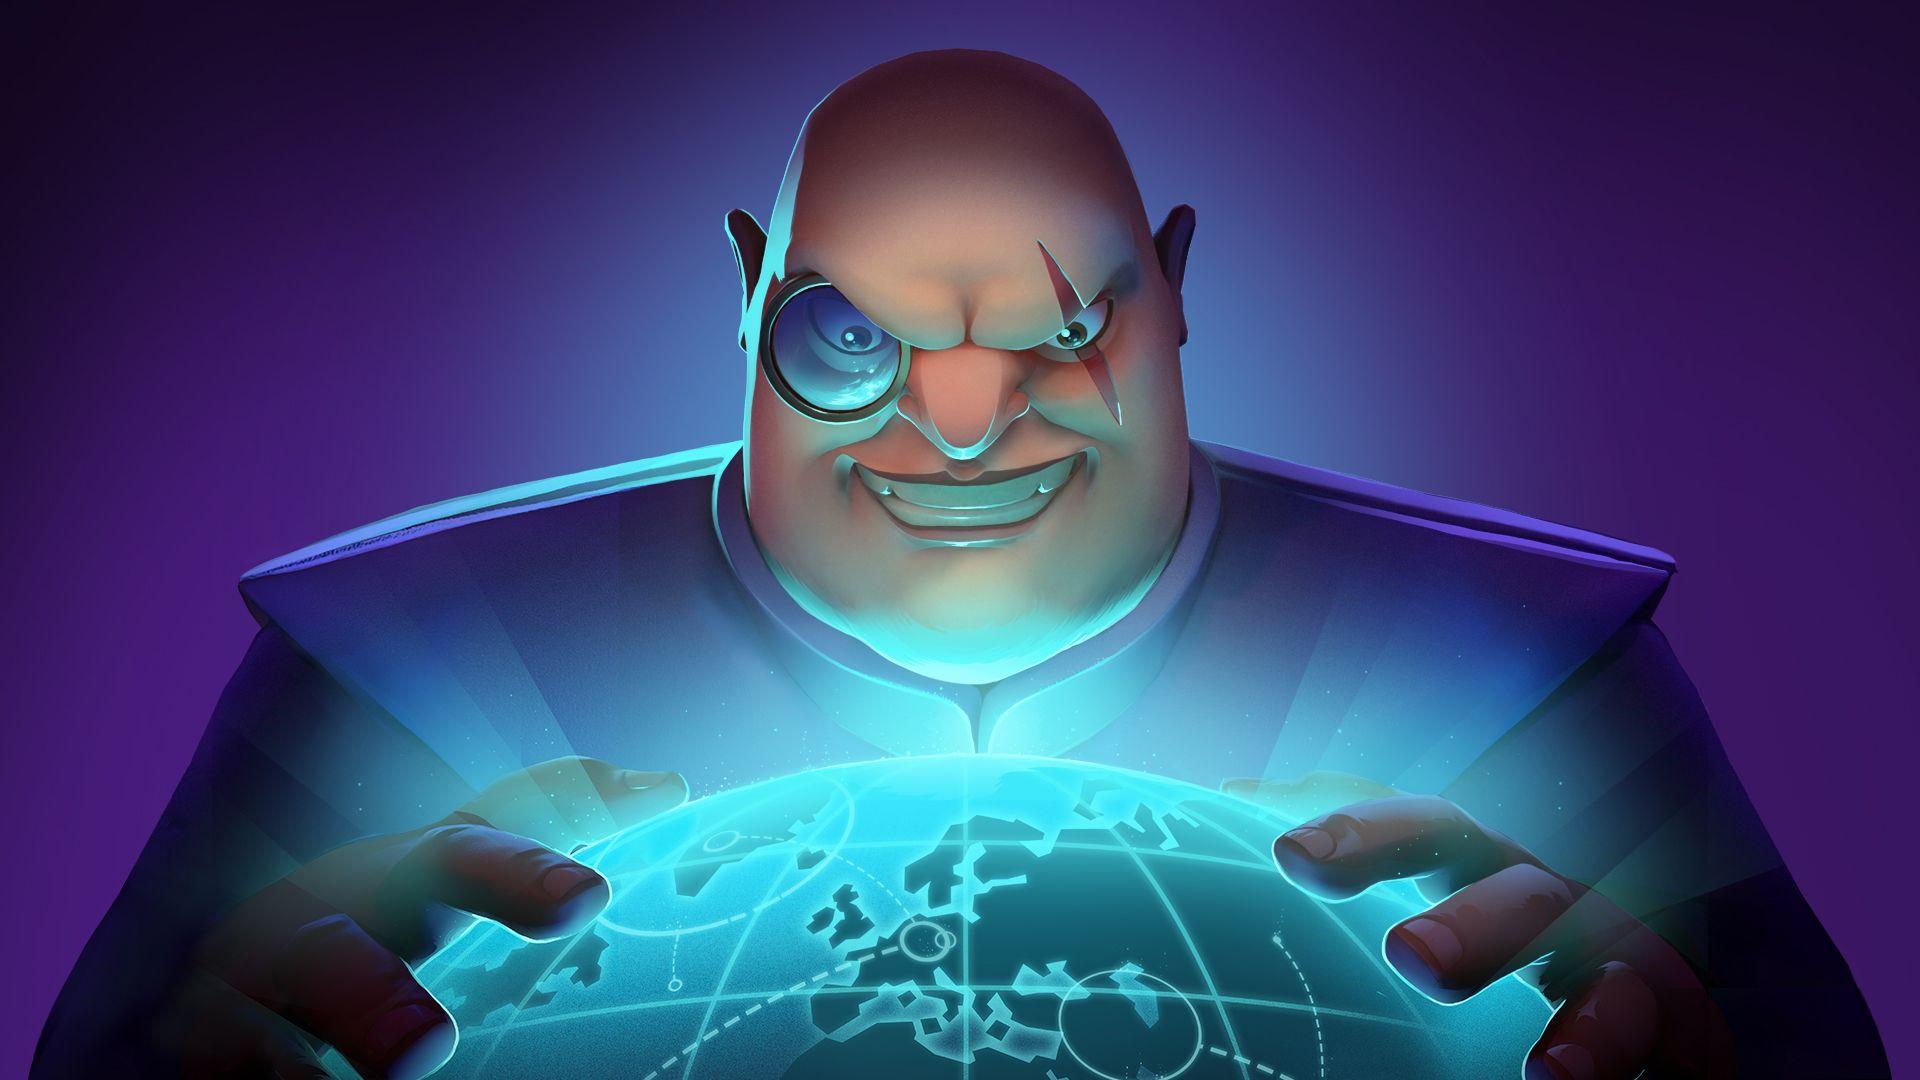 Evil Genius 2 Release Date march